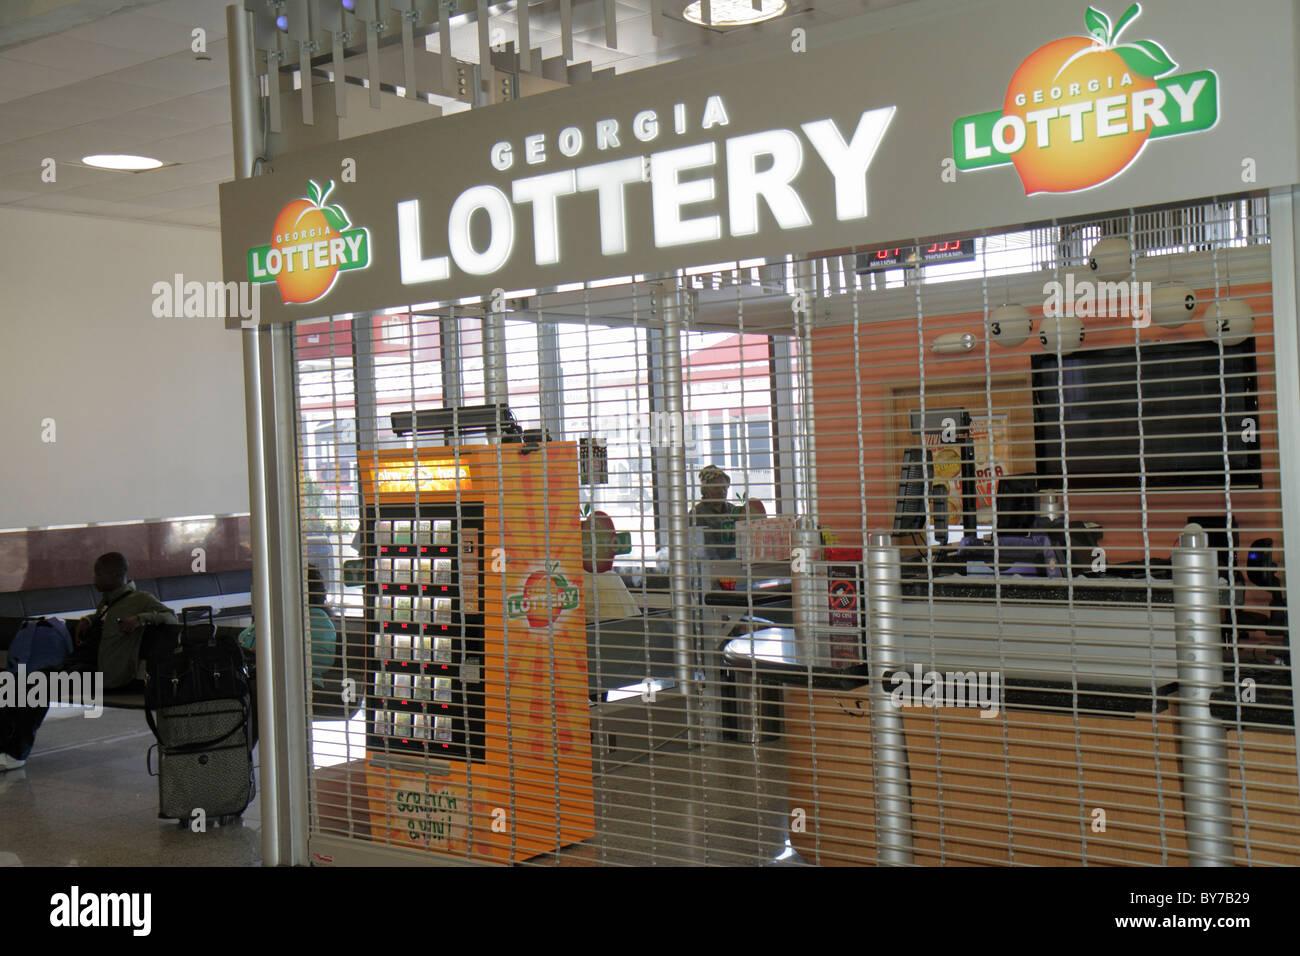 Atlanta georgia hartsfield jackson atlanta international airport concession georgia lottery gambling grille curtain stock photo